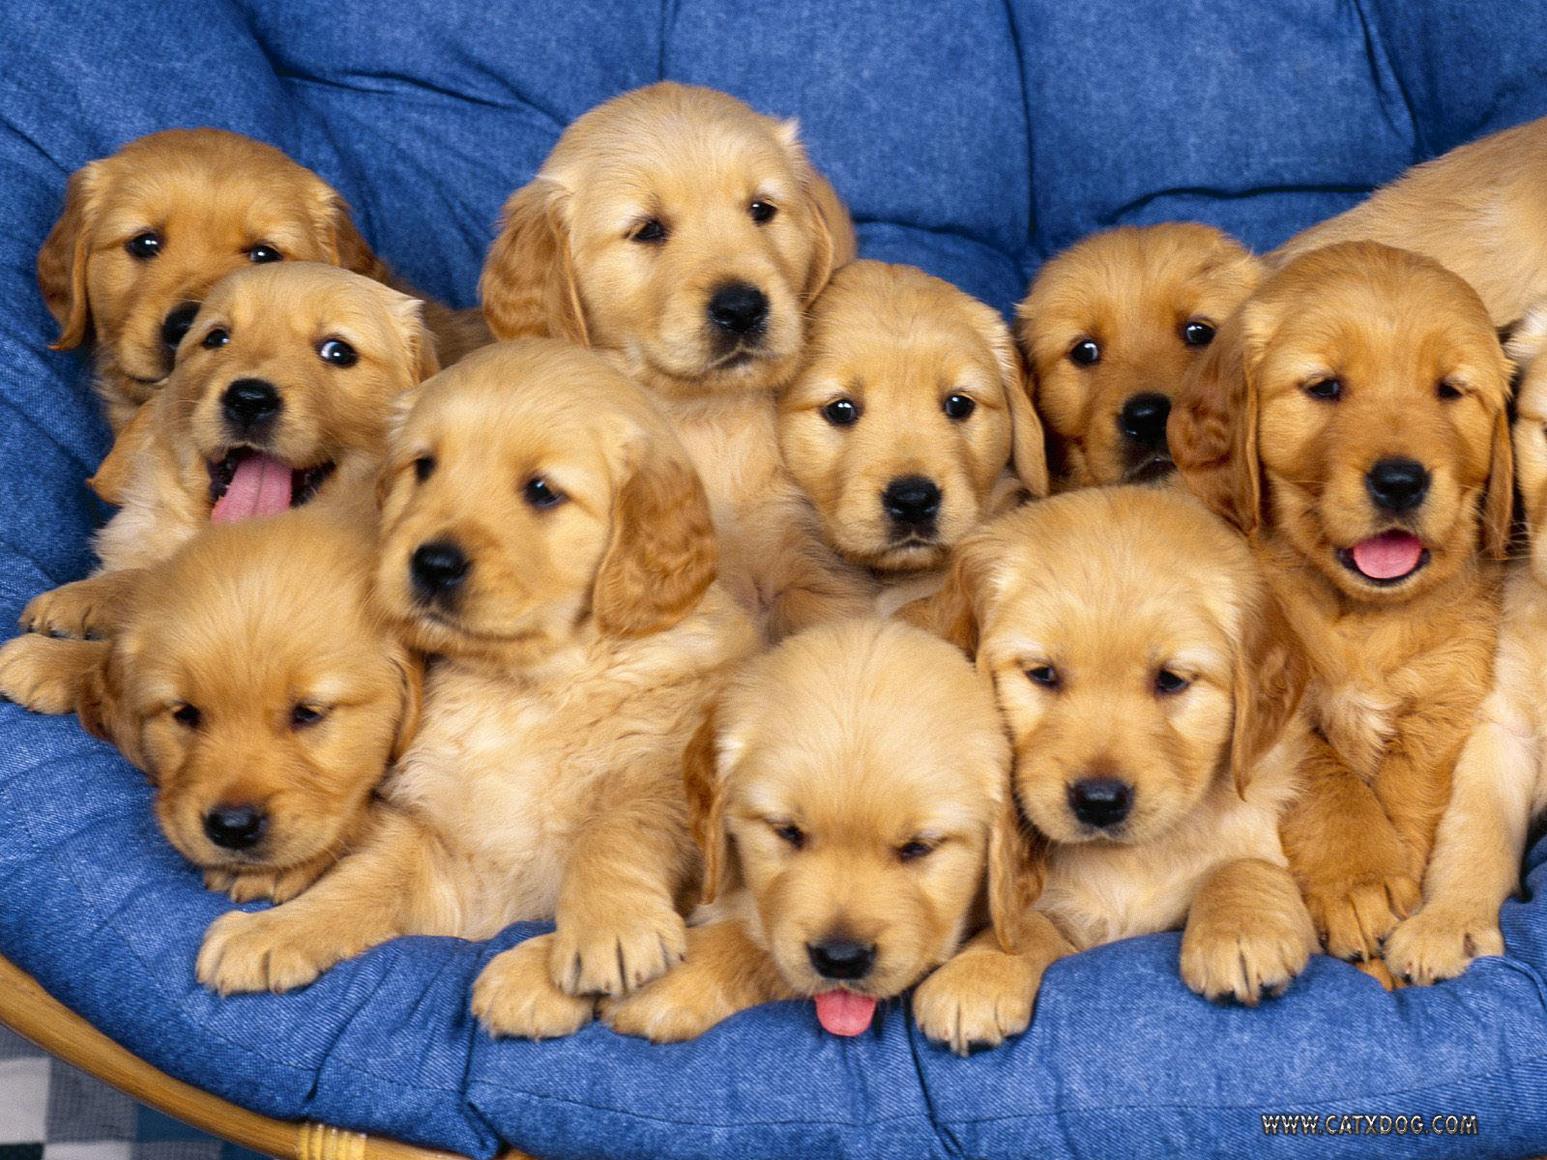 Cozy Puppy Pictures - Ivoiregion